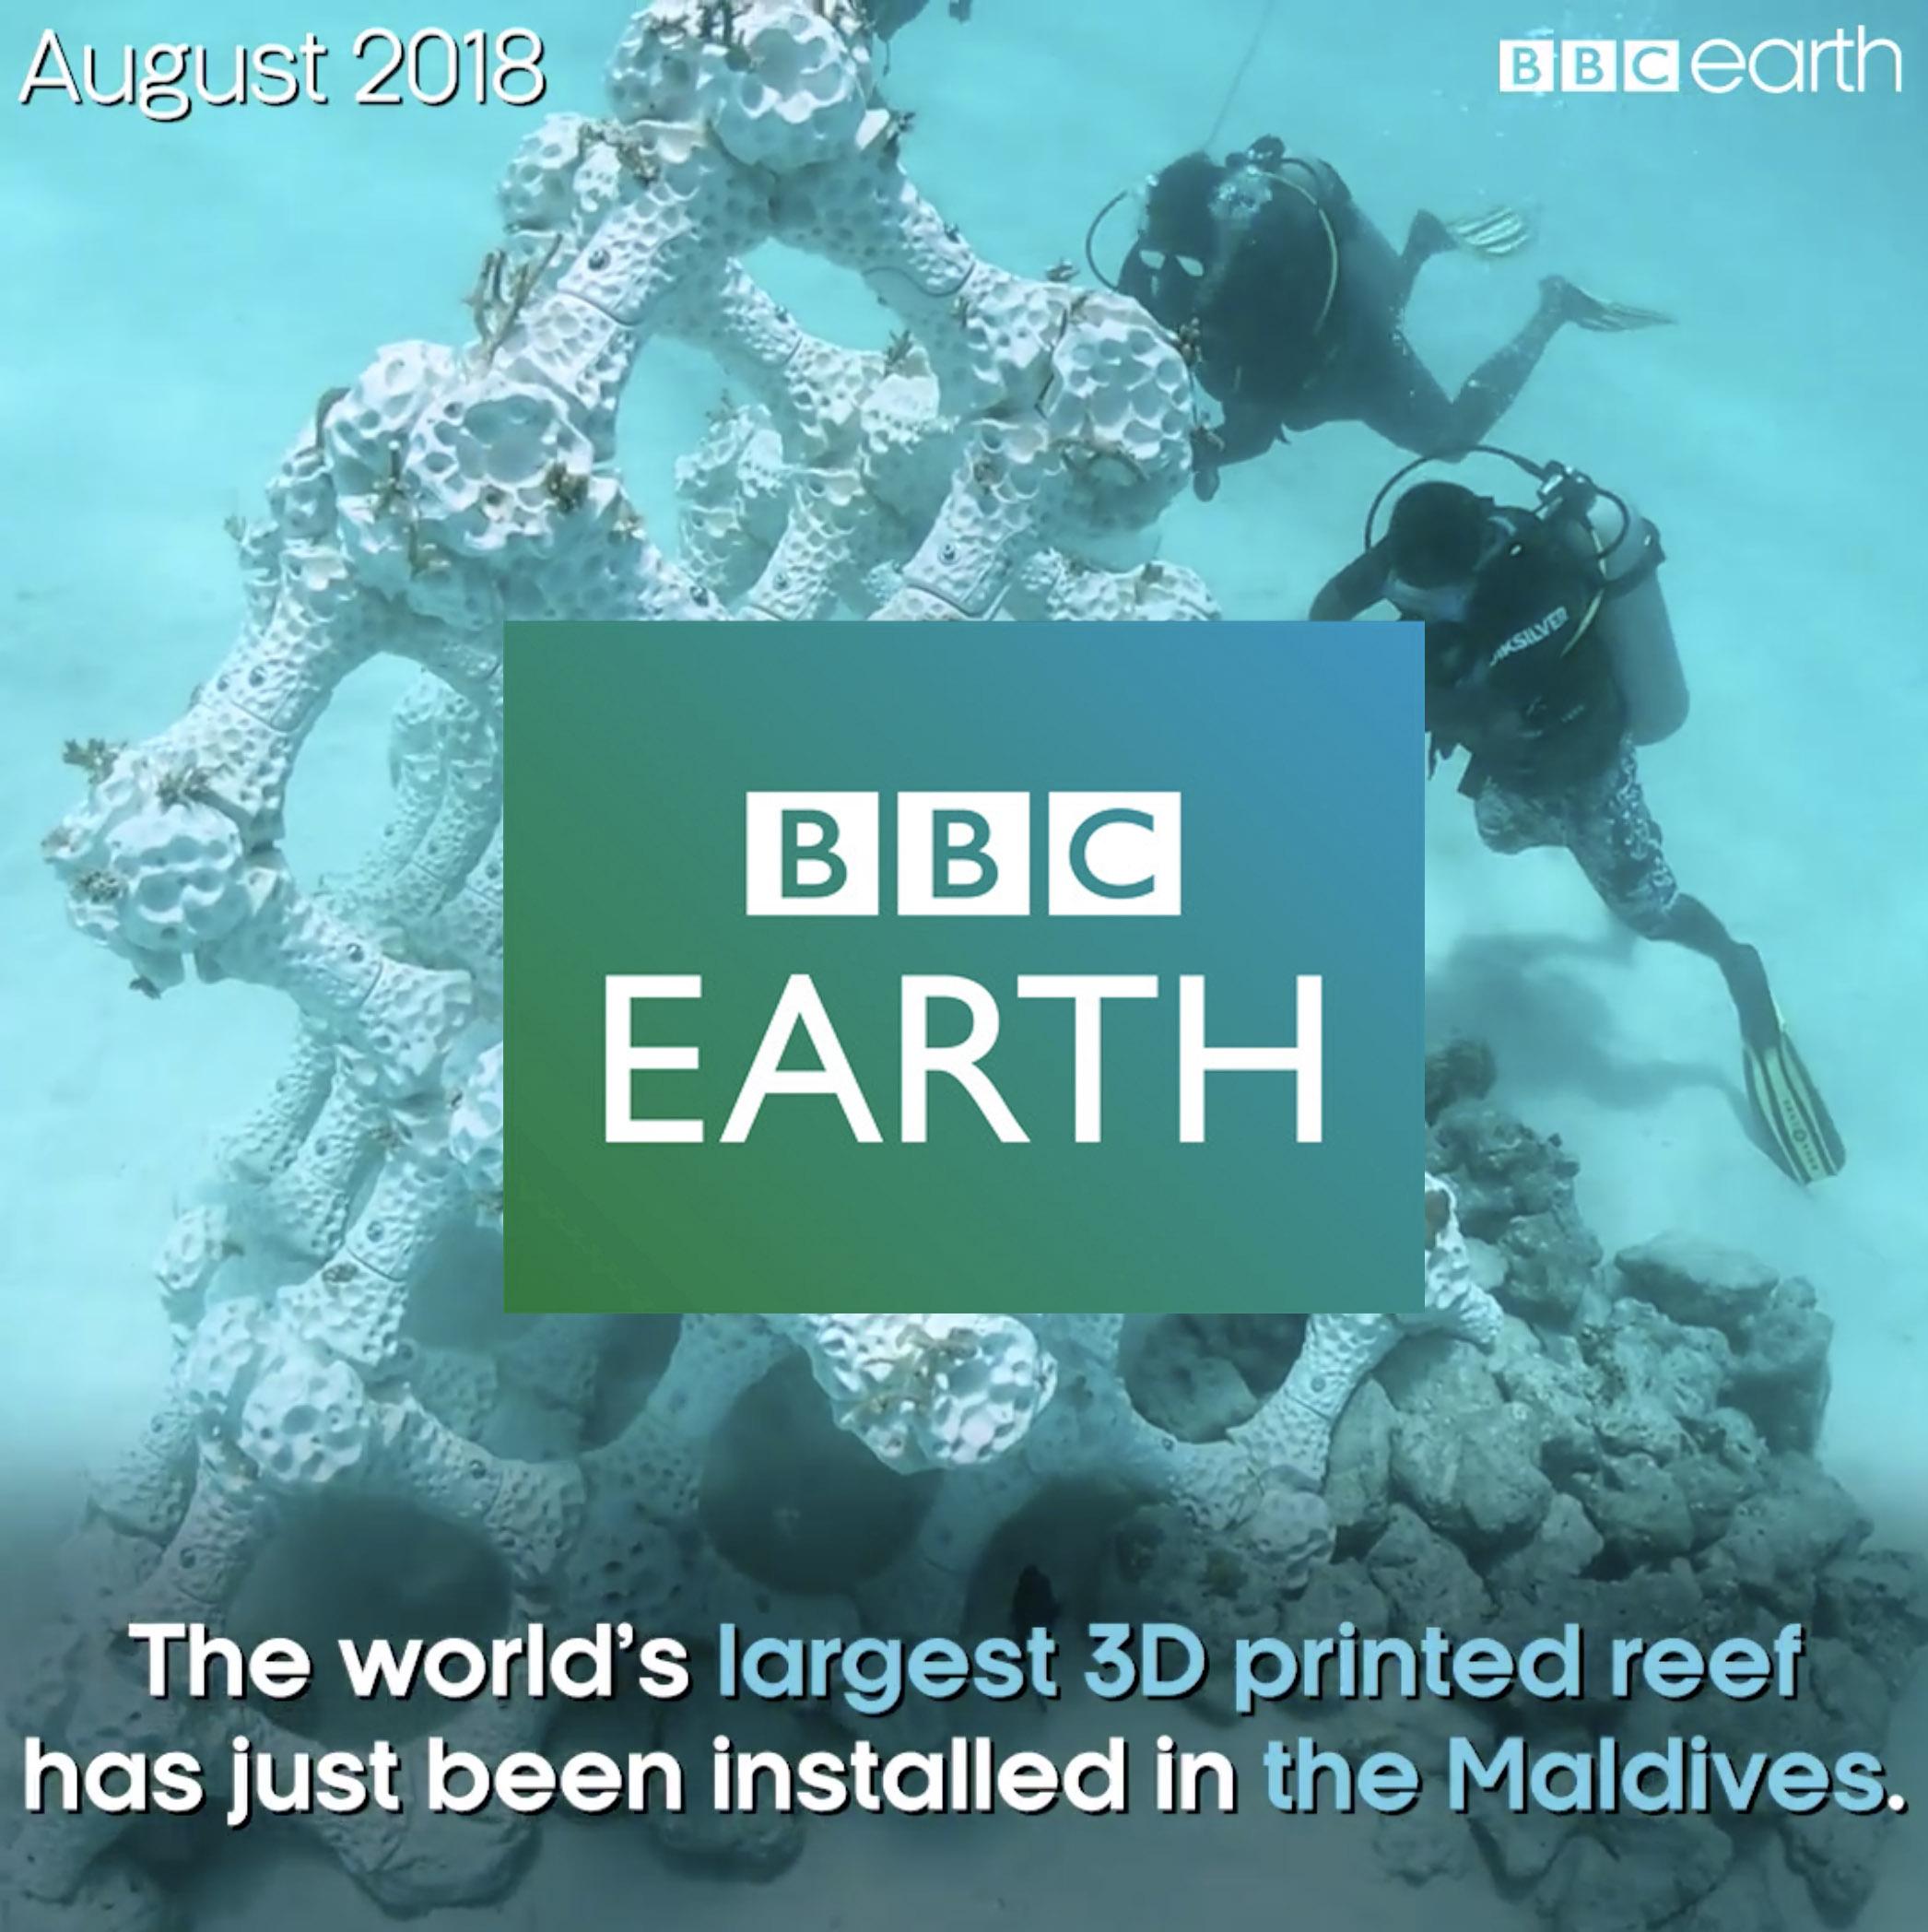 BBC EARTH Feature.jpg